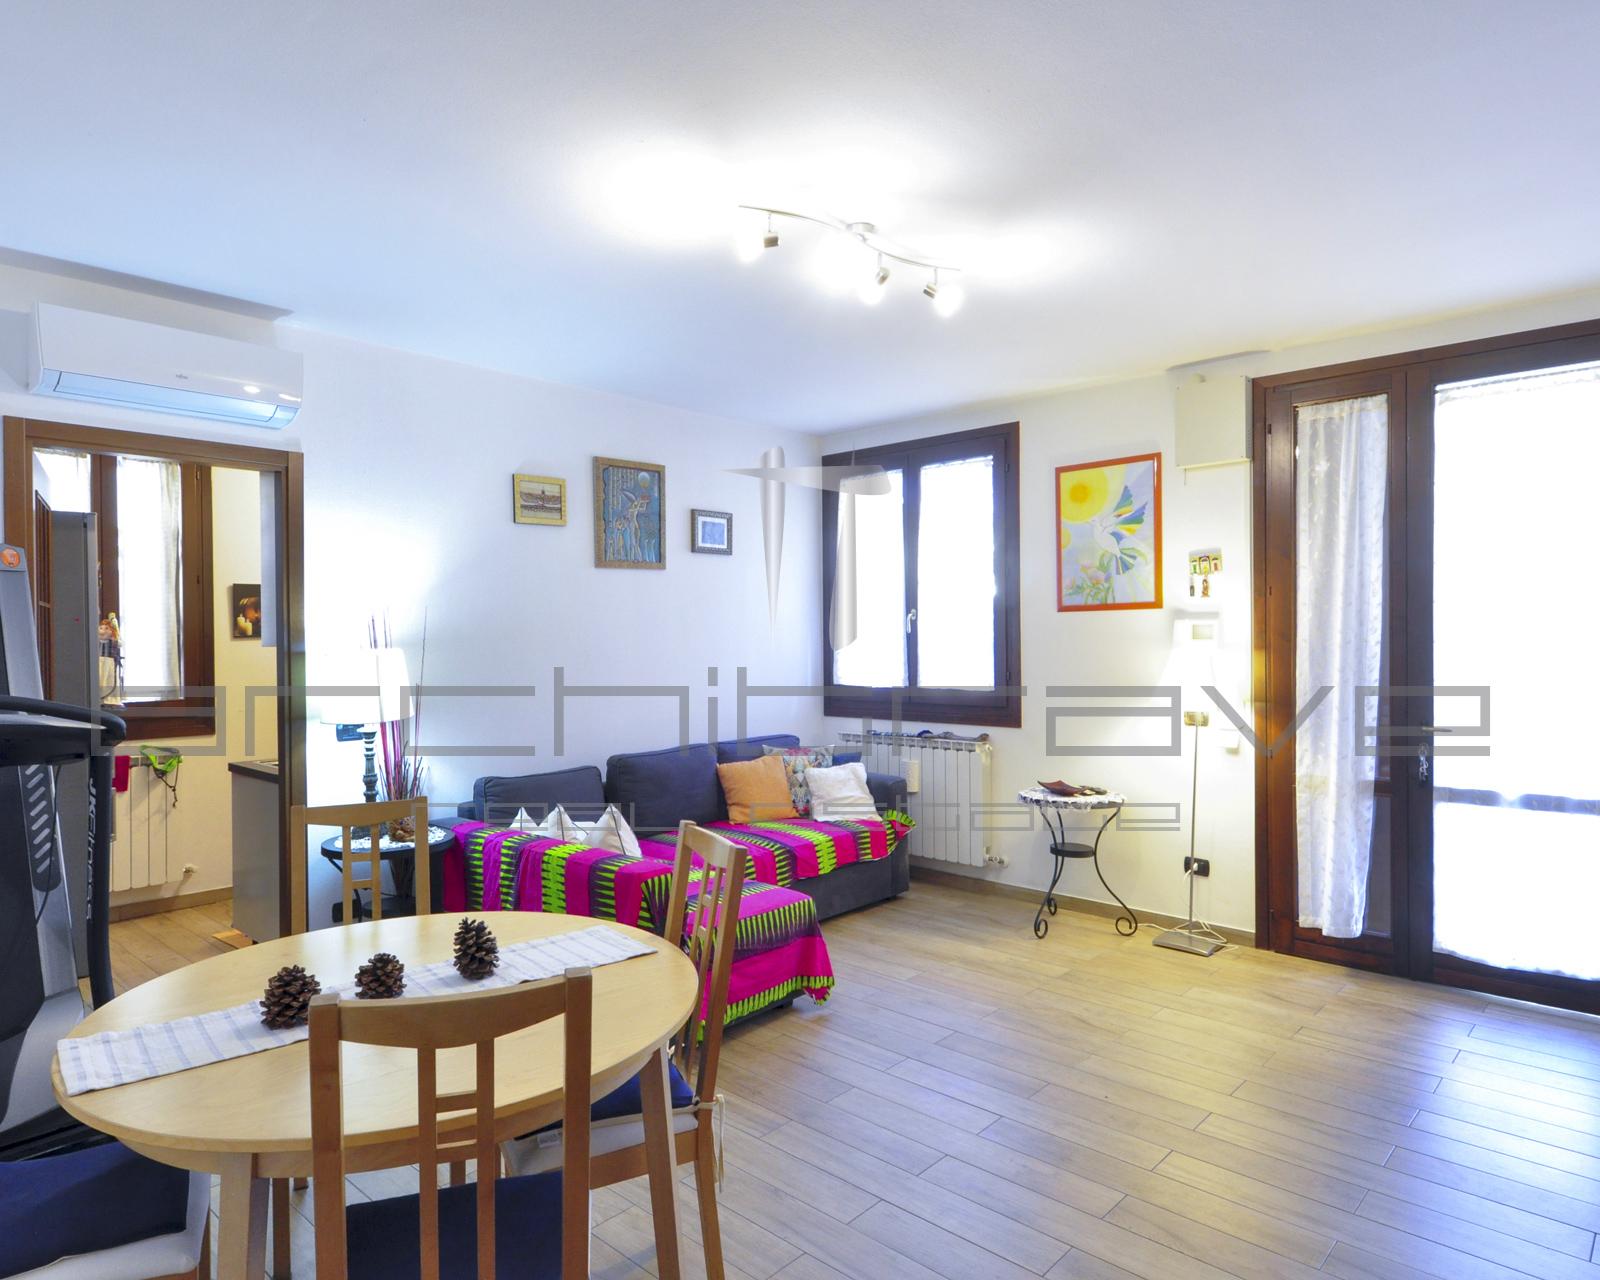 Appartamento con ingresso indipendente a Formigine – Rif 678